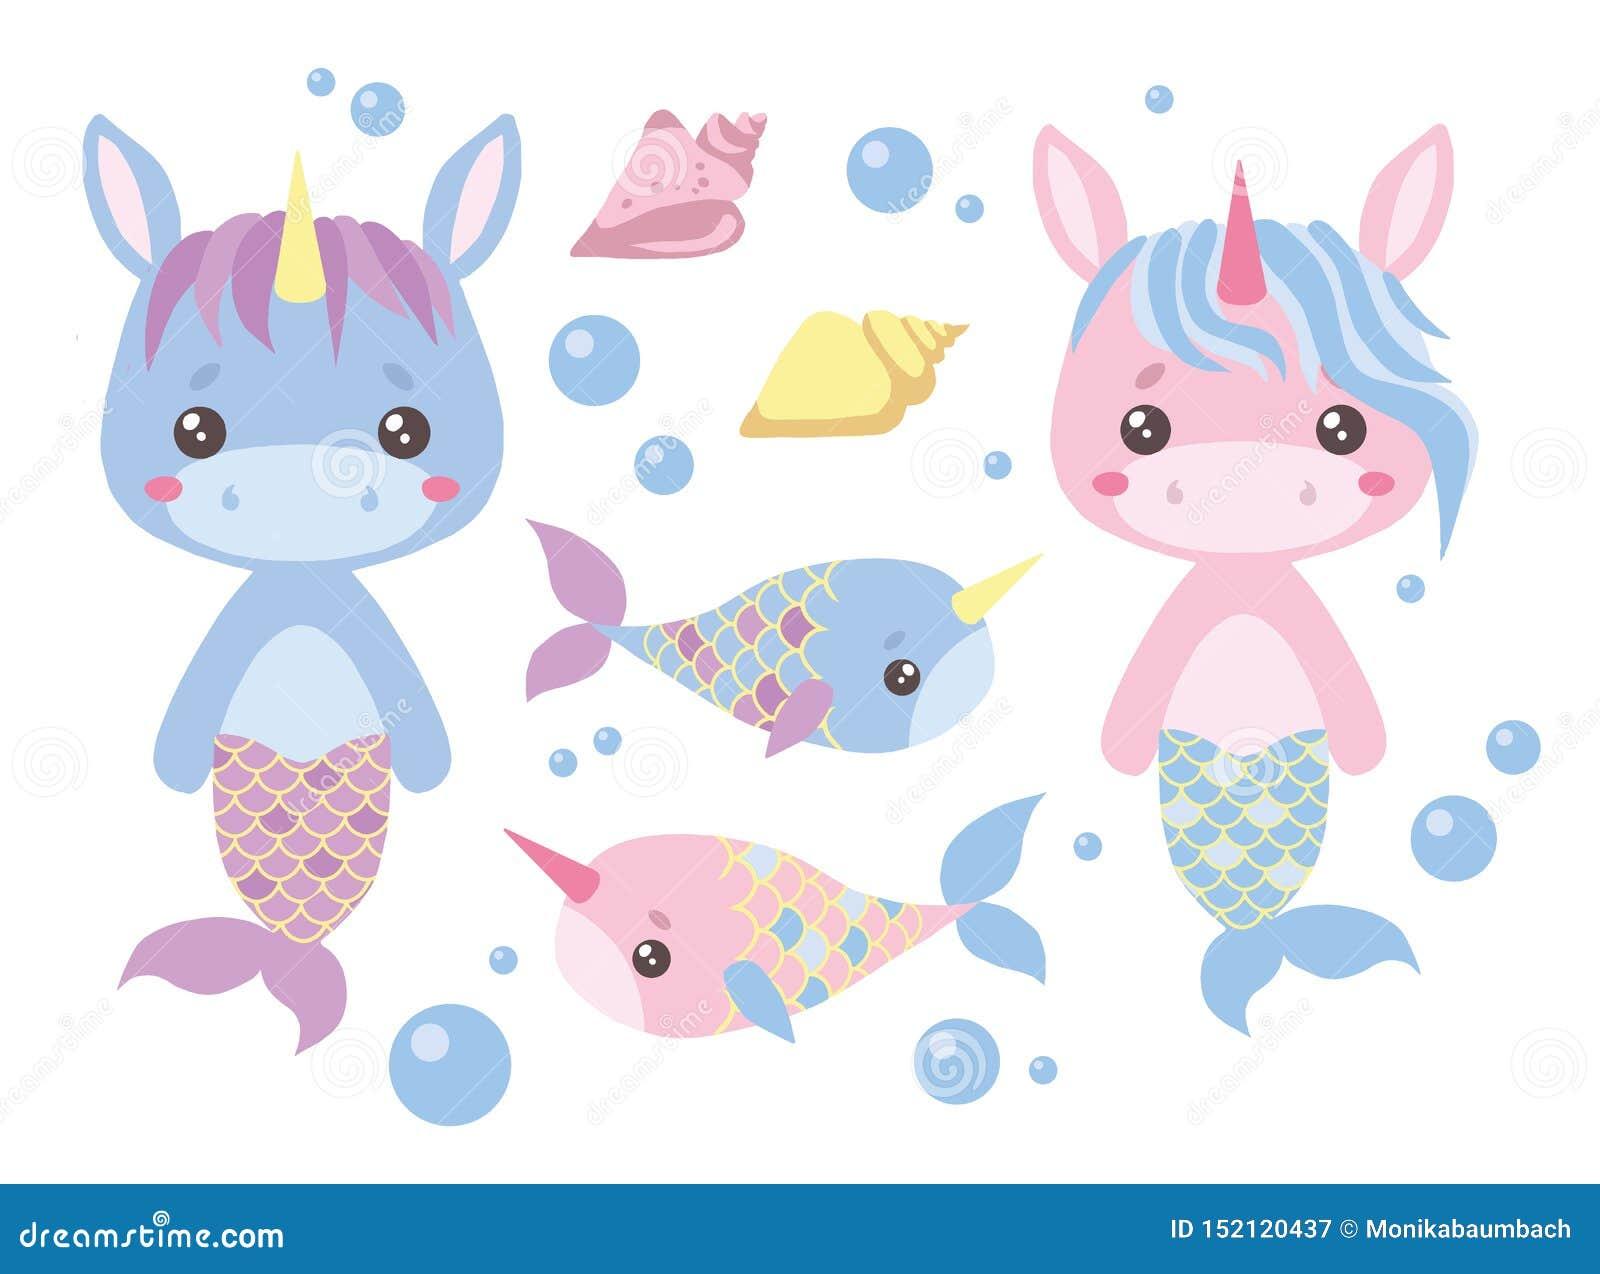 Baby pink and blue cartoon unicorn mermaids, swordfish, seashell and water bubbles vector illustration set